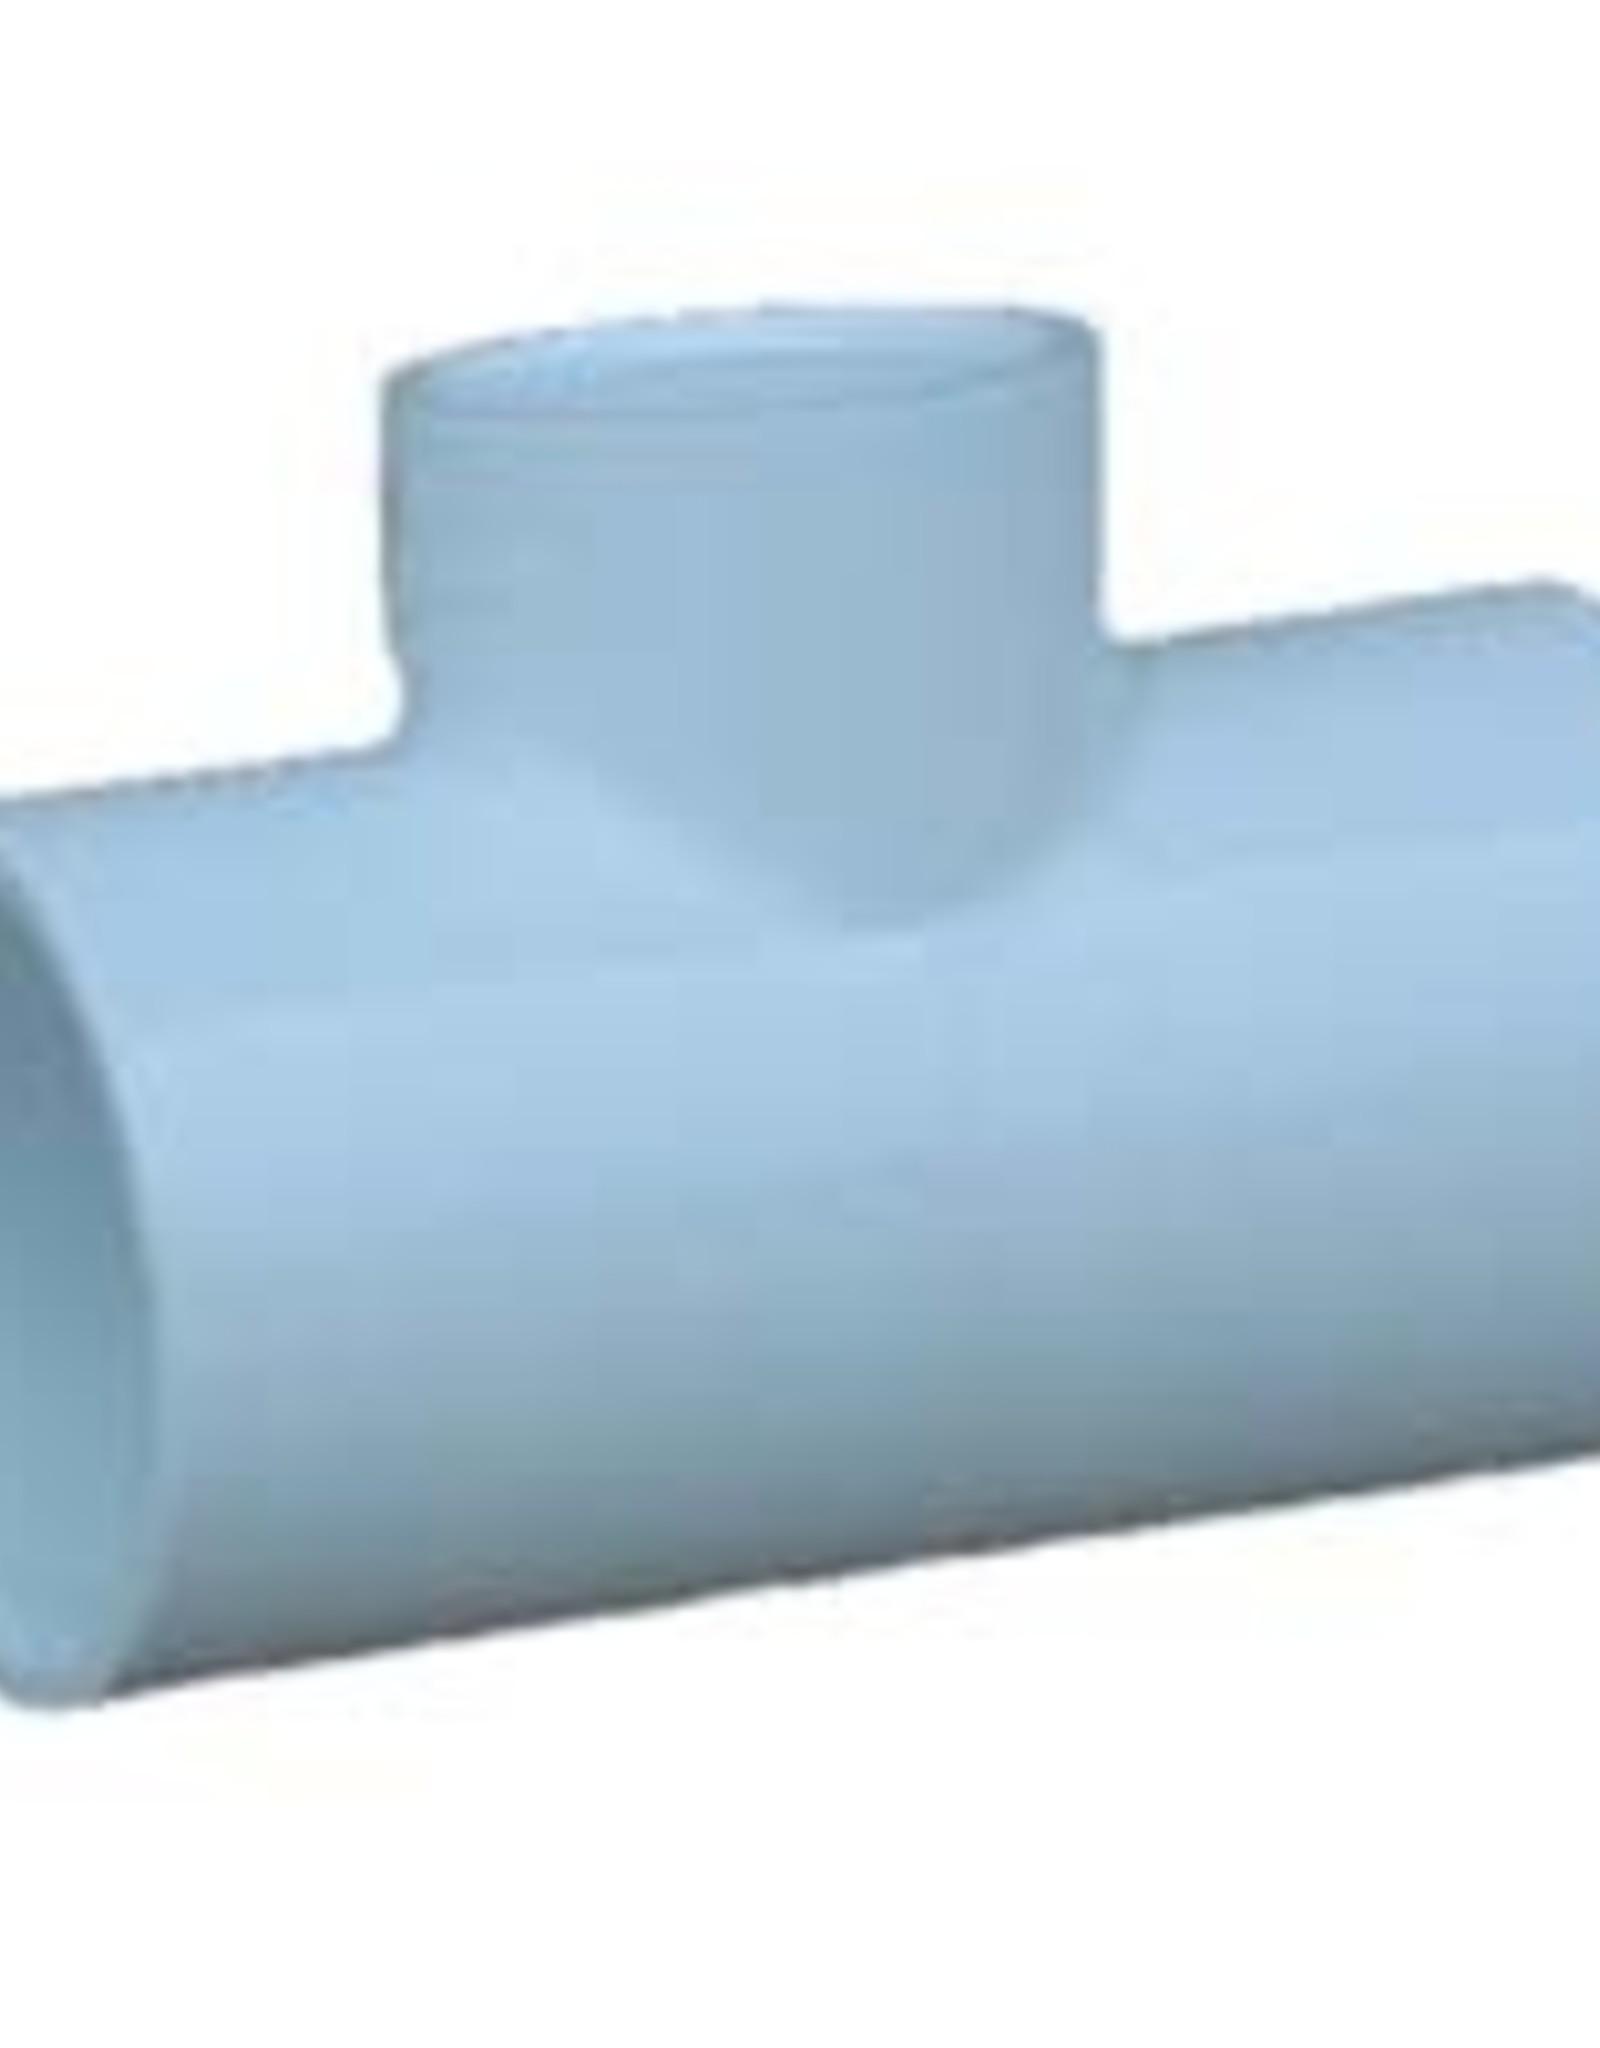 Charlotte Pipe & Foundry PVC 3/4 X 3/4 X 1/2 Tee Slip x Slip x Slip SCH 40